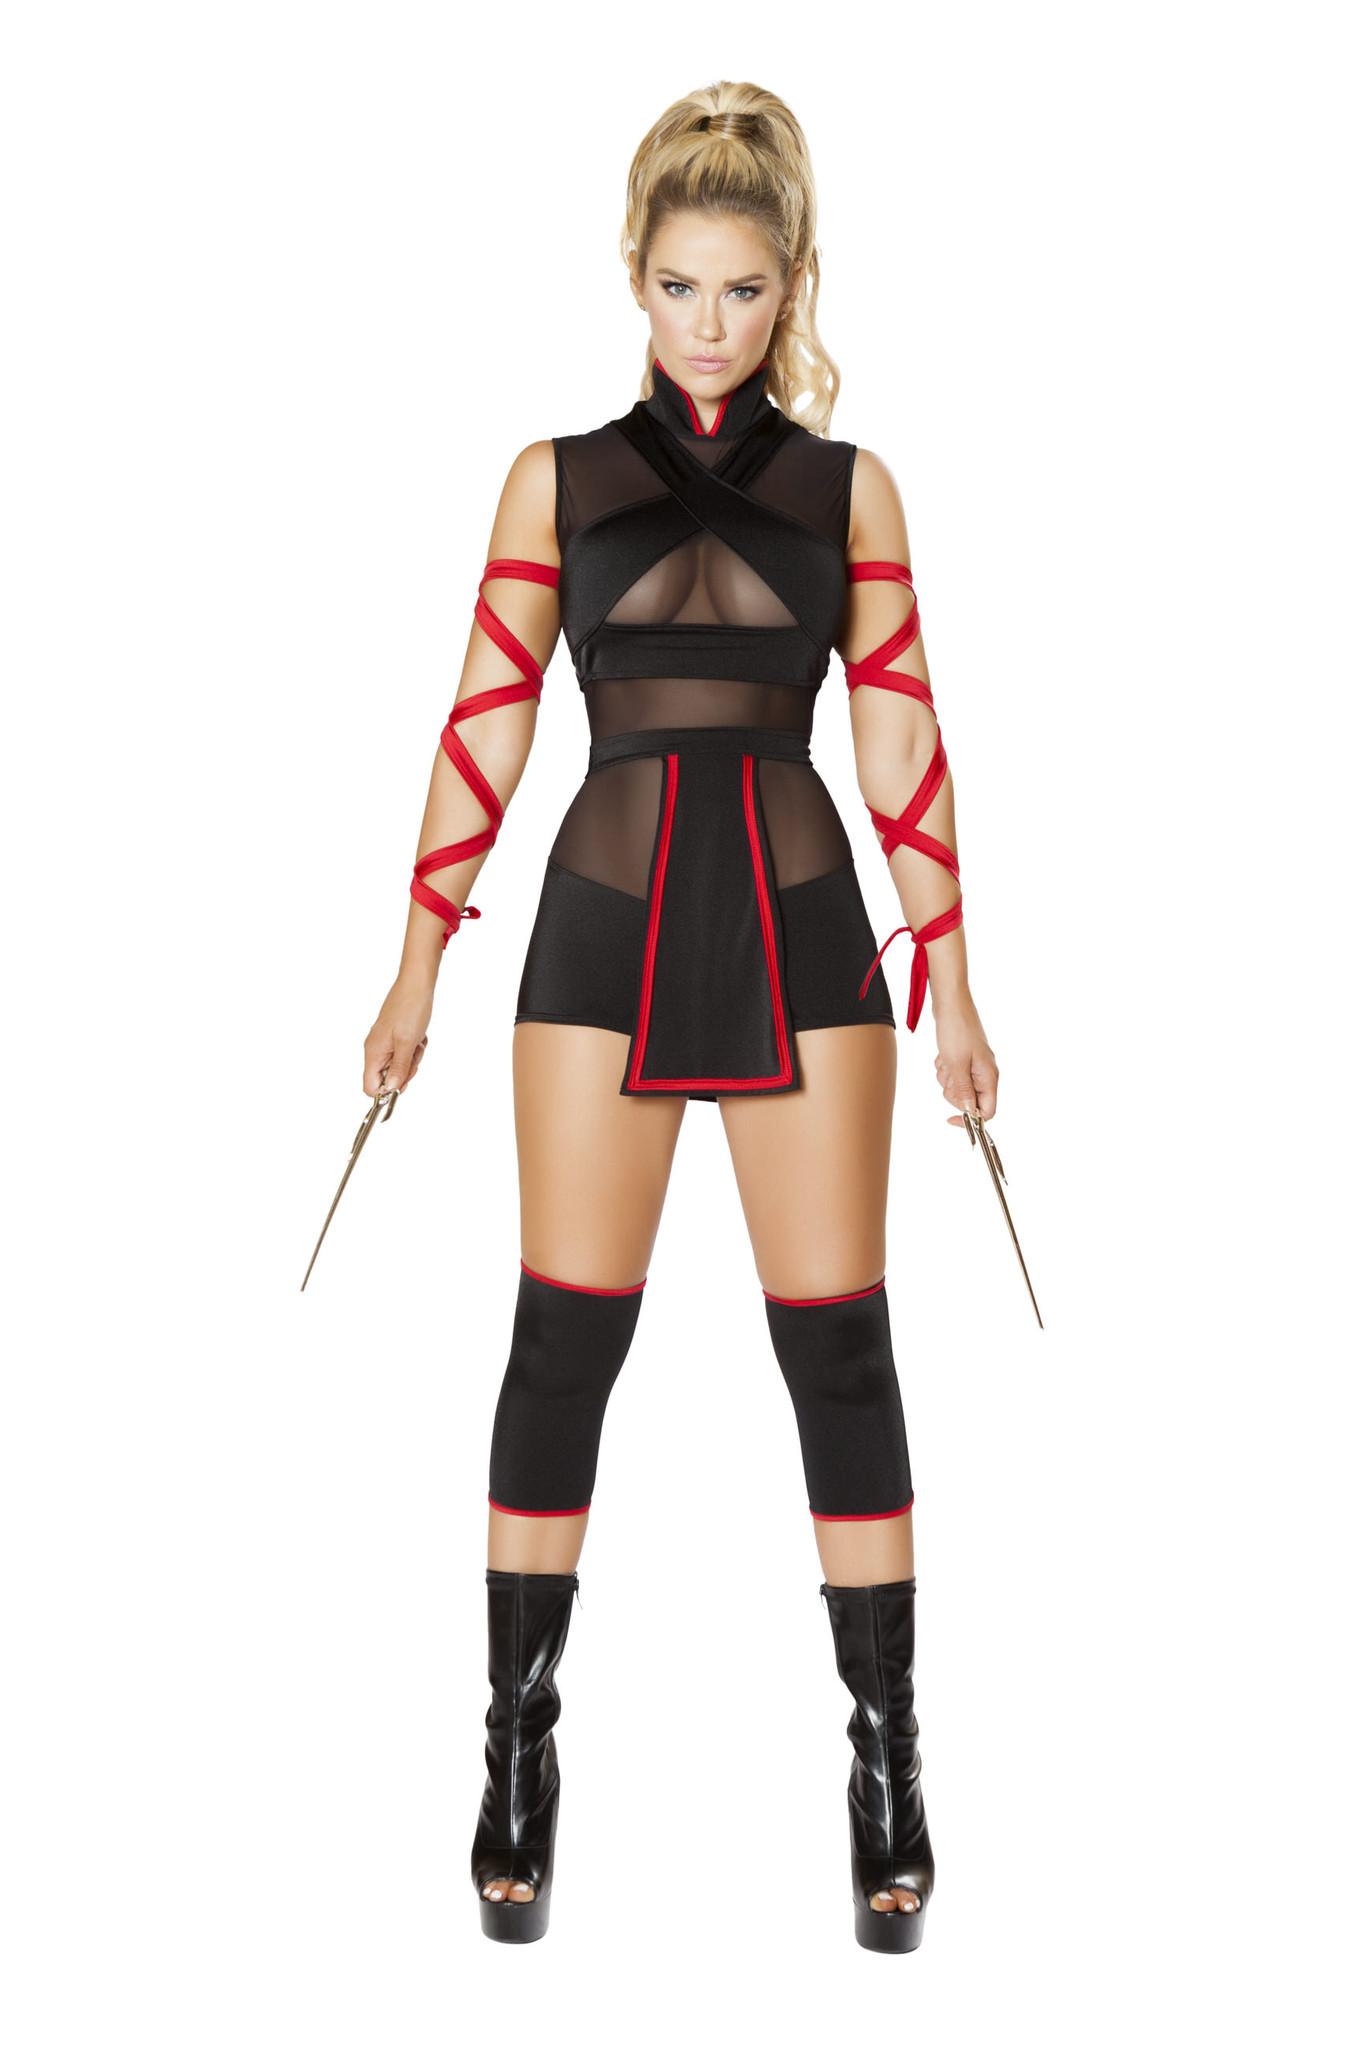 Costume de Ninja Woman - Roma